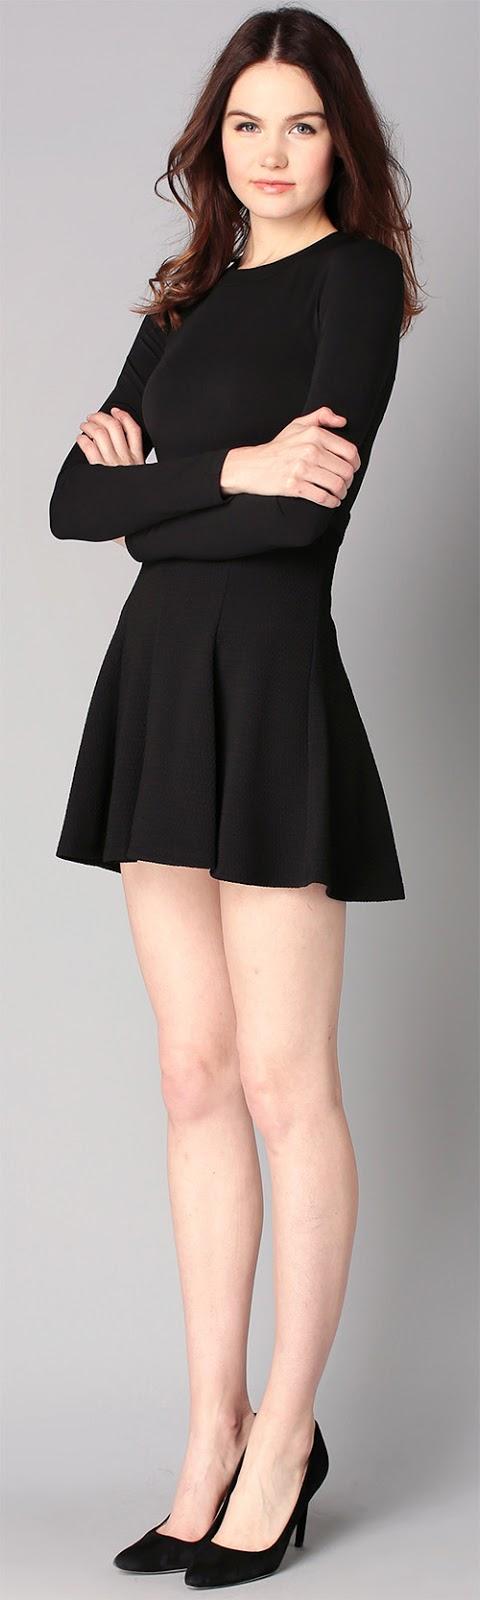 Robe jupe noire courte BCBGeneration